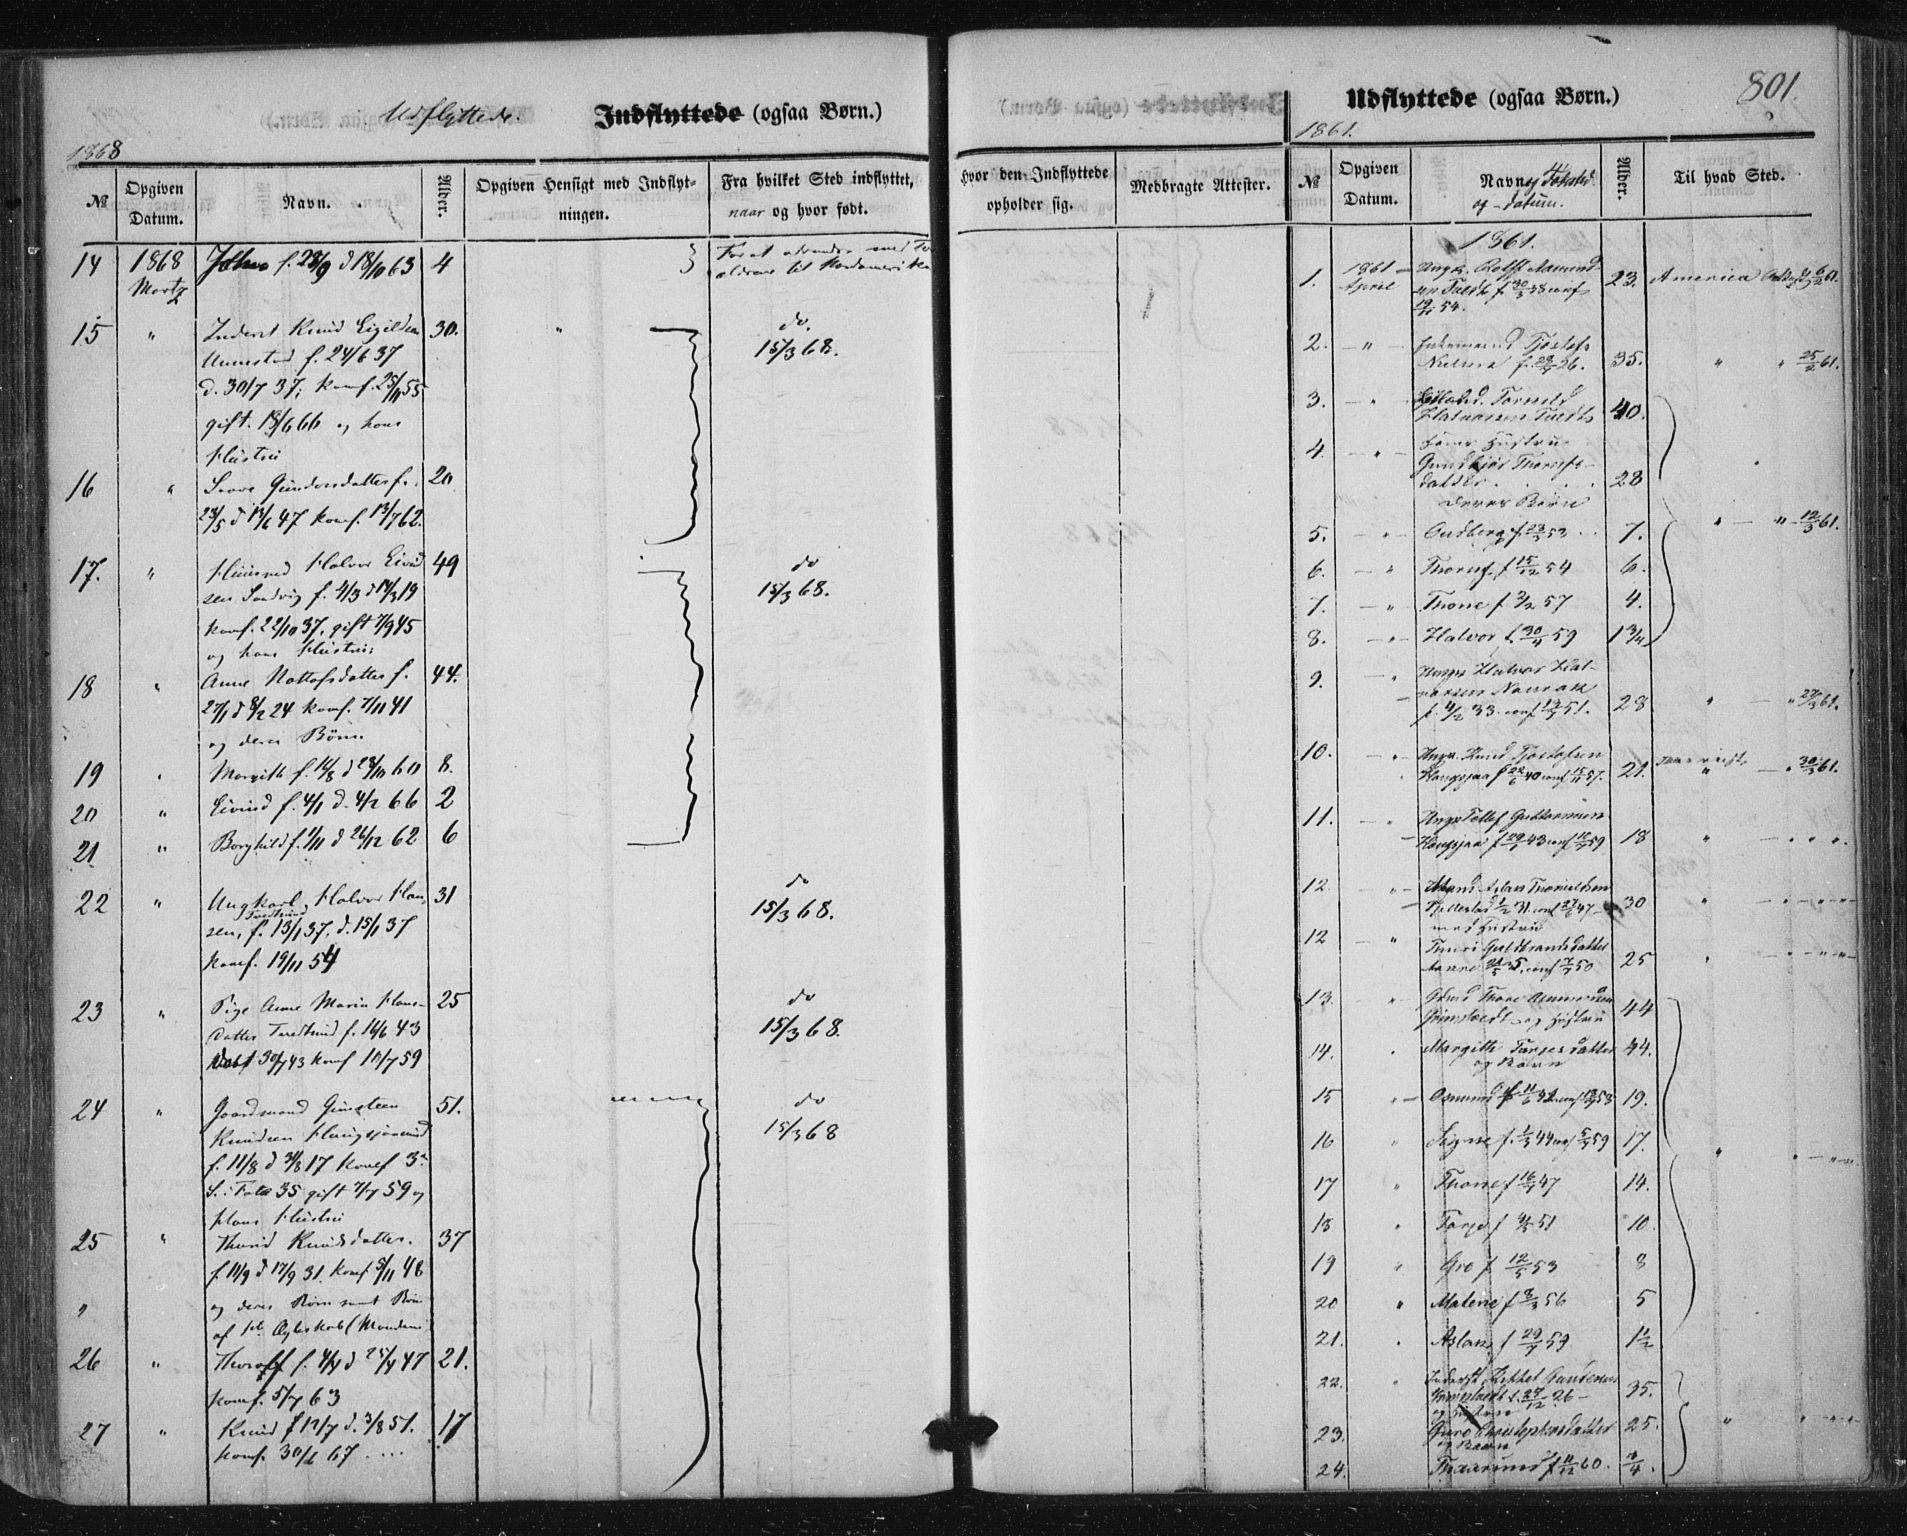 SAKO, Nissedal kirkebøker, F/Fa/L0003: Ministerialbok nr. I 3, 1846-1870, s. 800-801